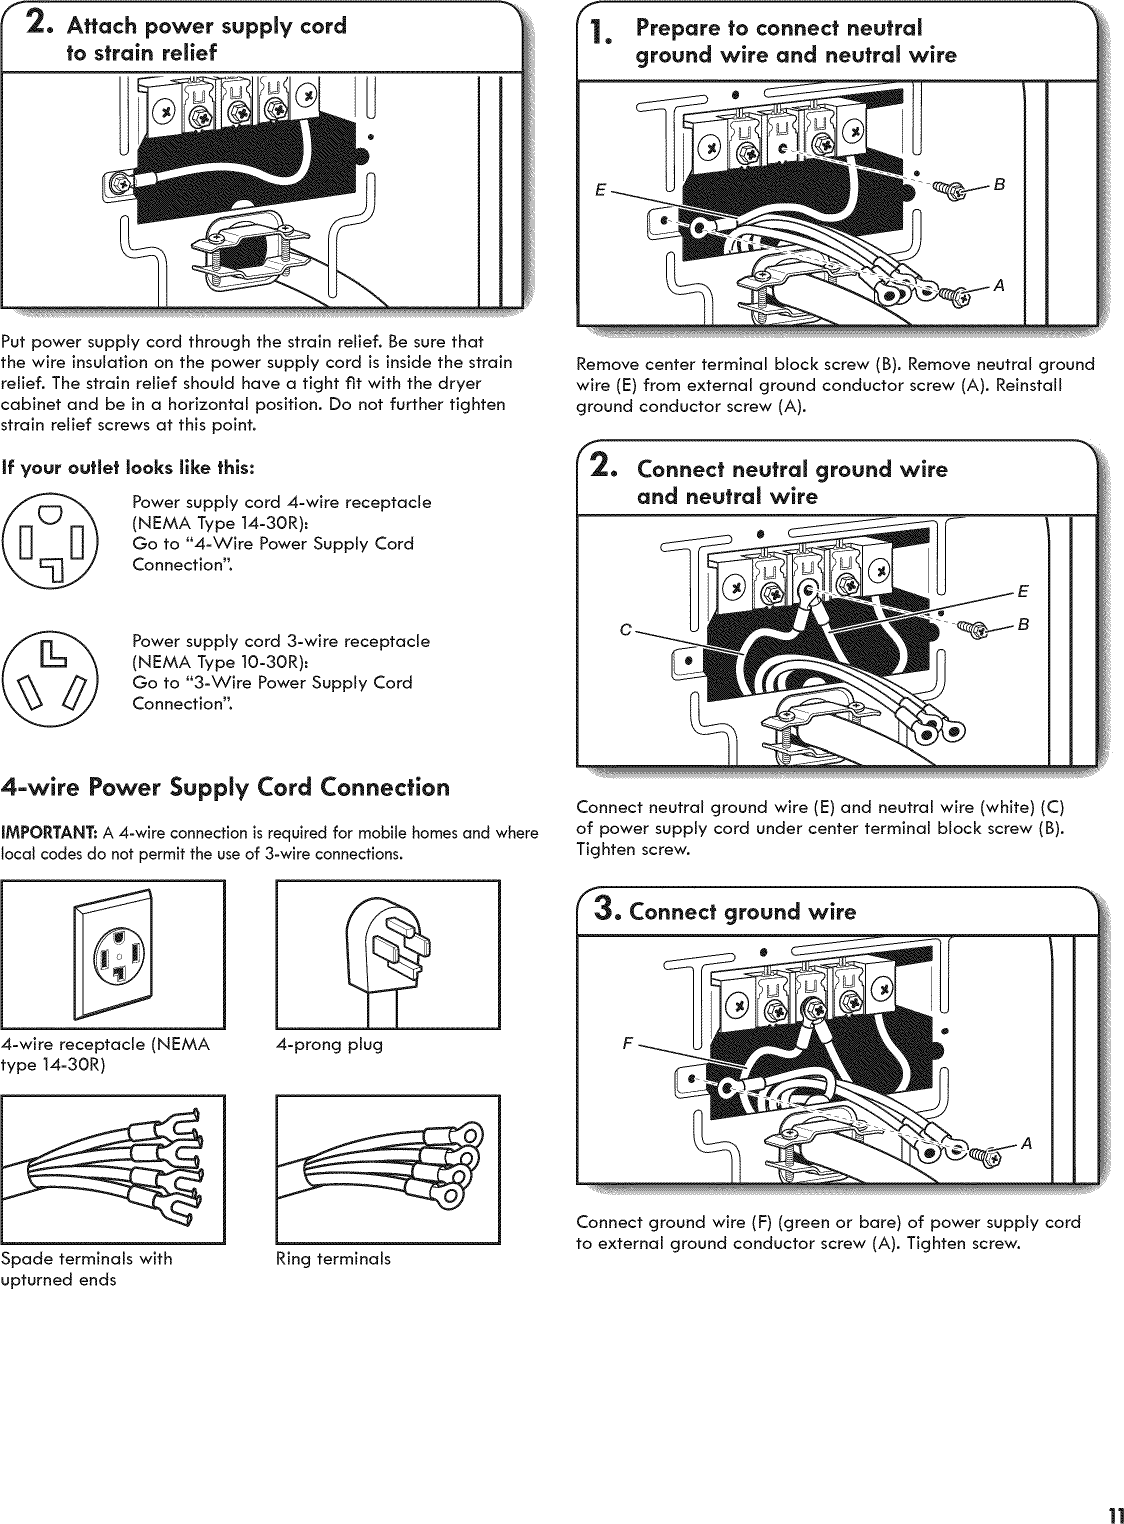 Unique Neutral Wire In A Plug Embellishment - Wiring Schematics and ...